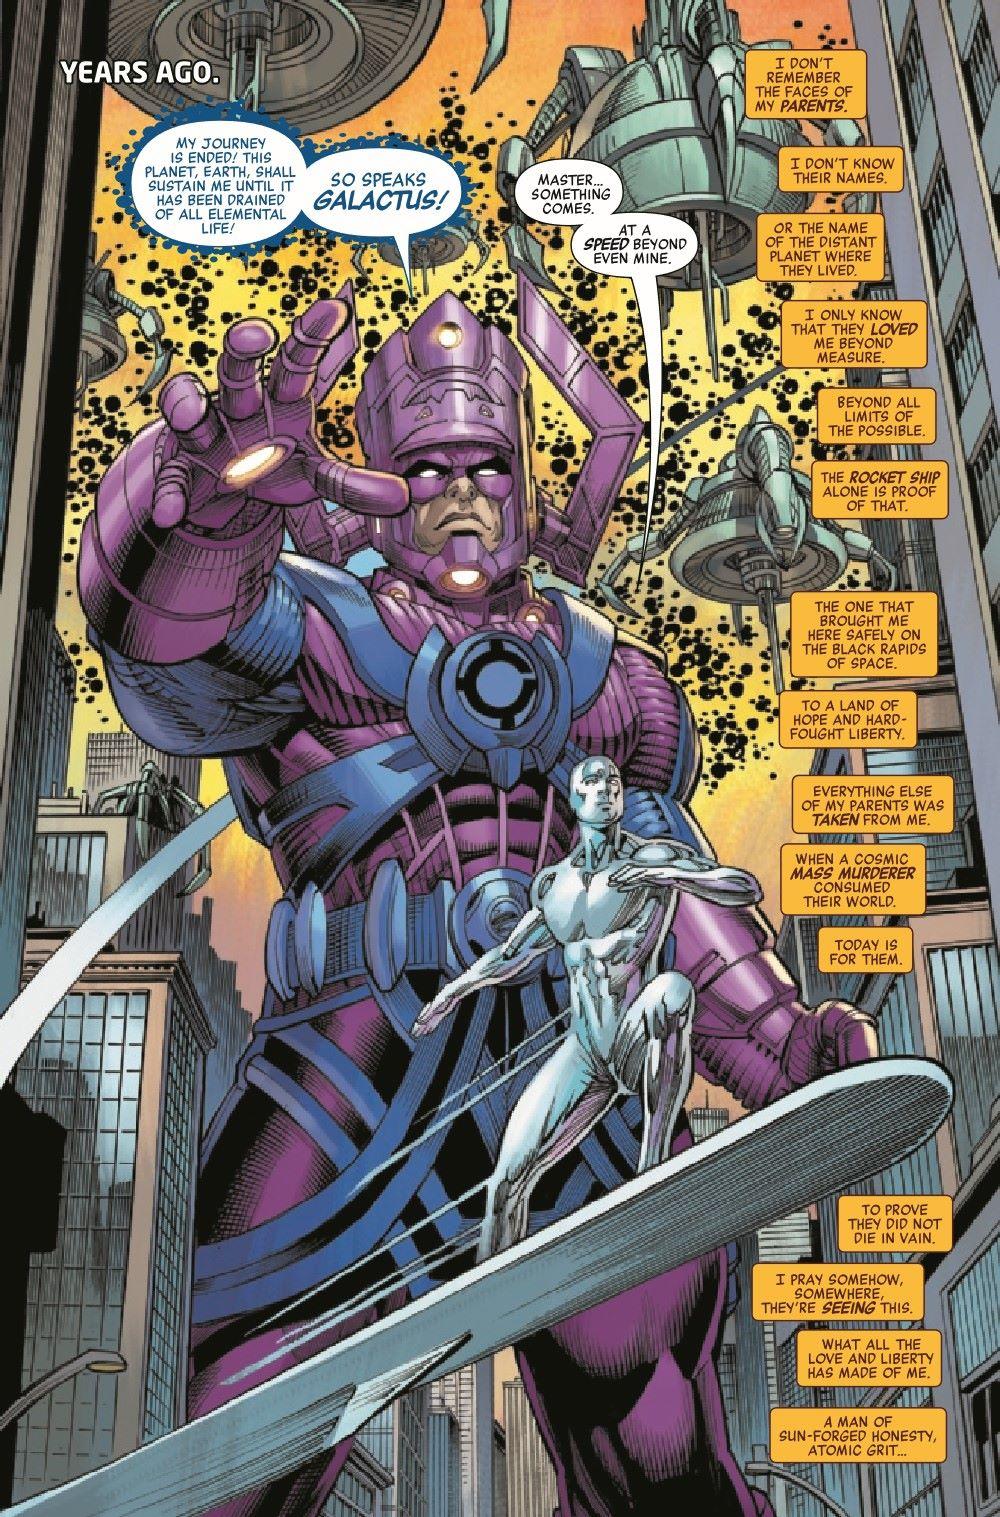 HEROESREBORN2021002_Preview-3 ComicList Previews: HEROES REBORN #2 (OF 7)